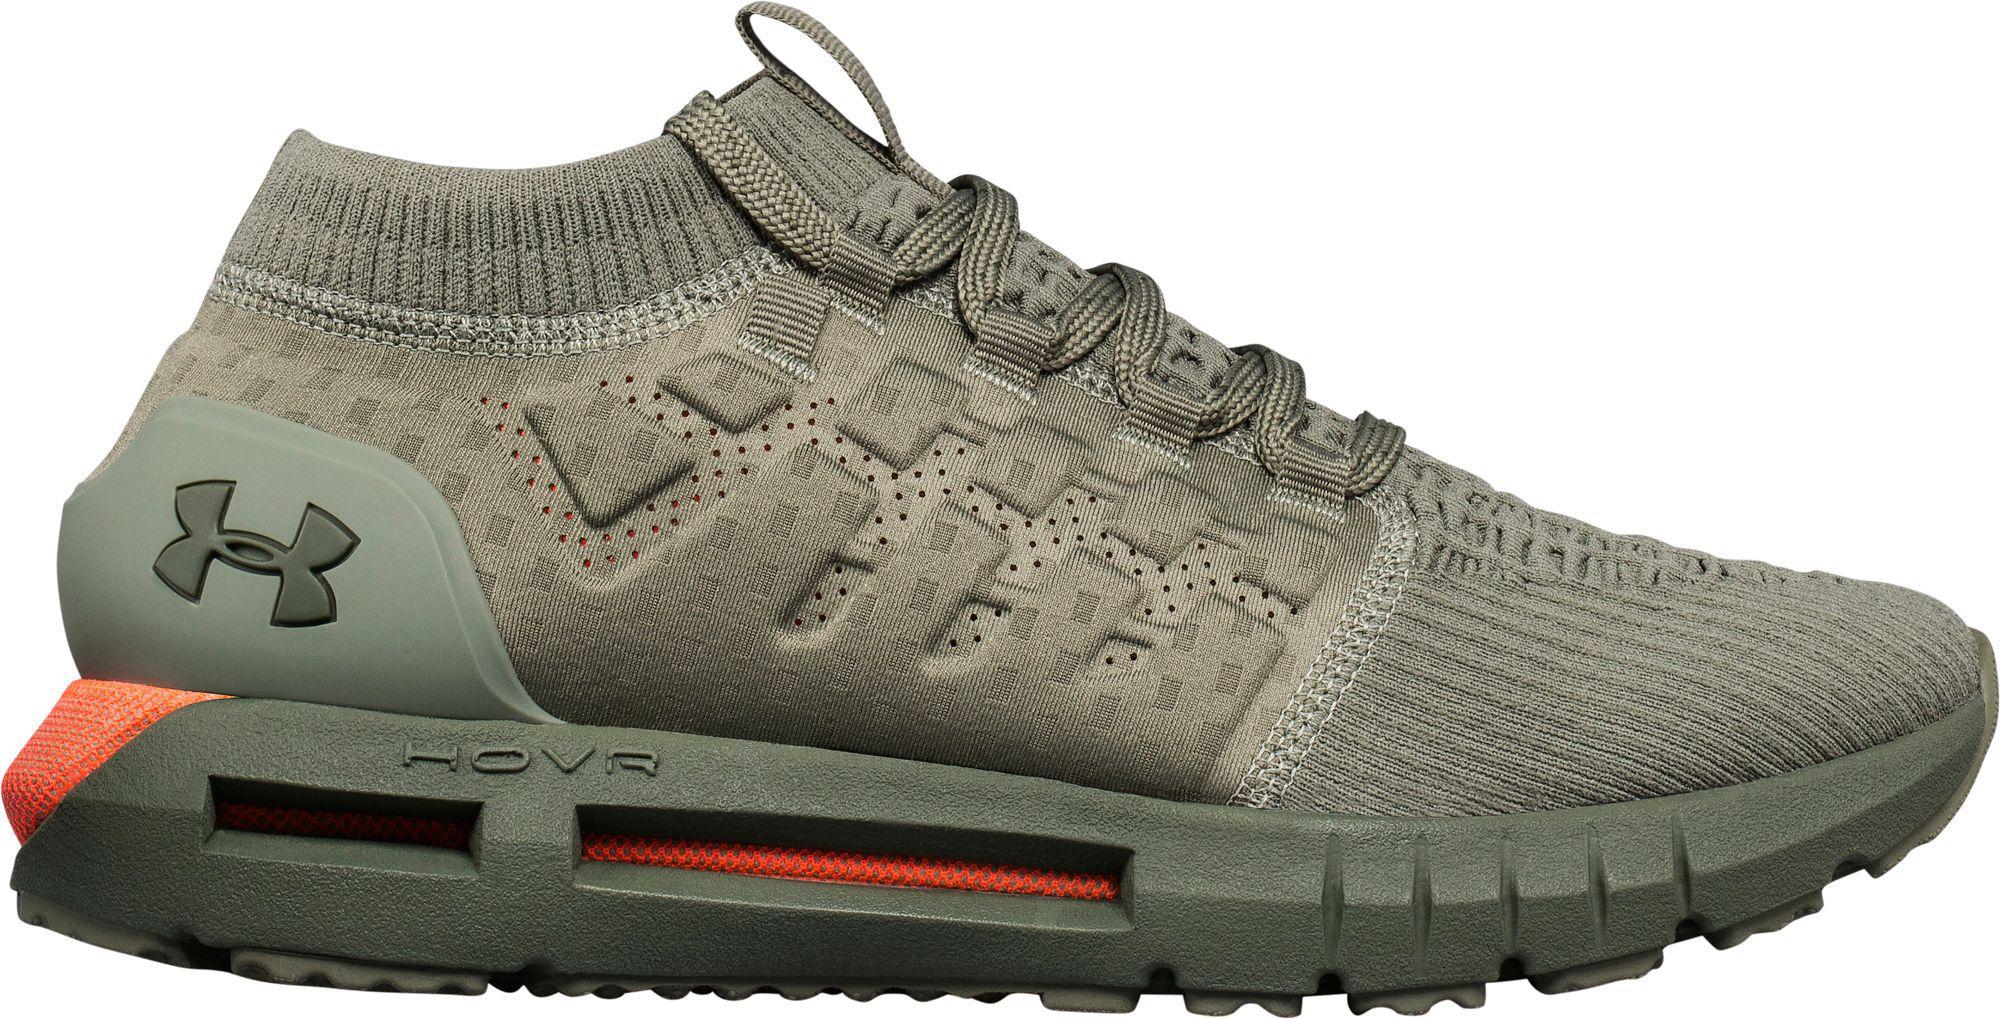 1351d9563 Under Armour Hovr Phantom Running Shoes in Green for Men - Lyst